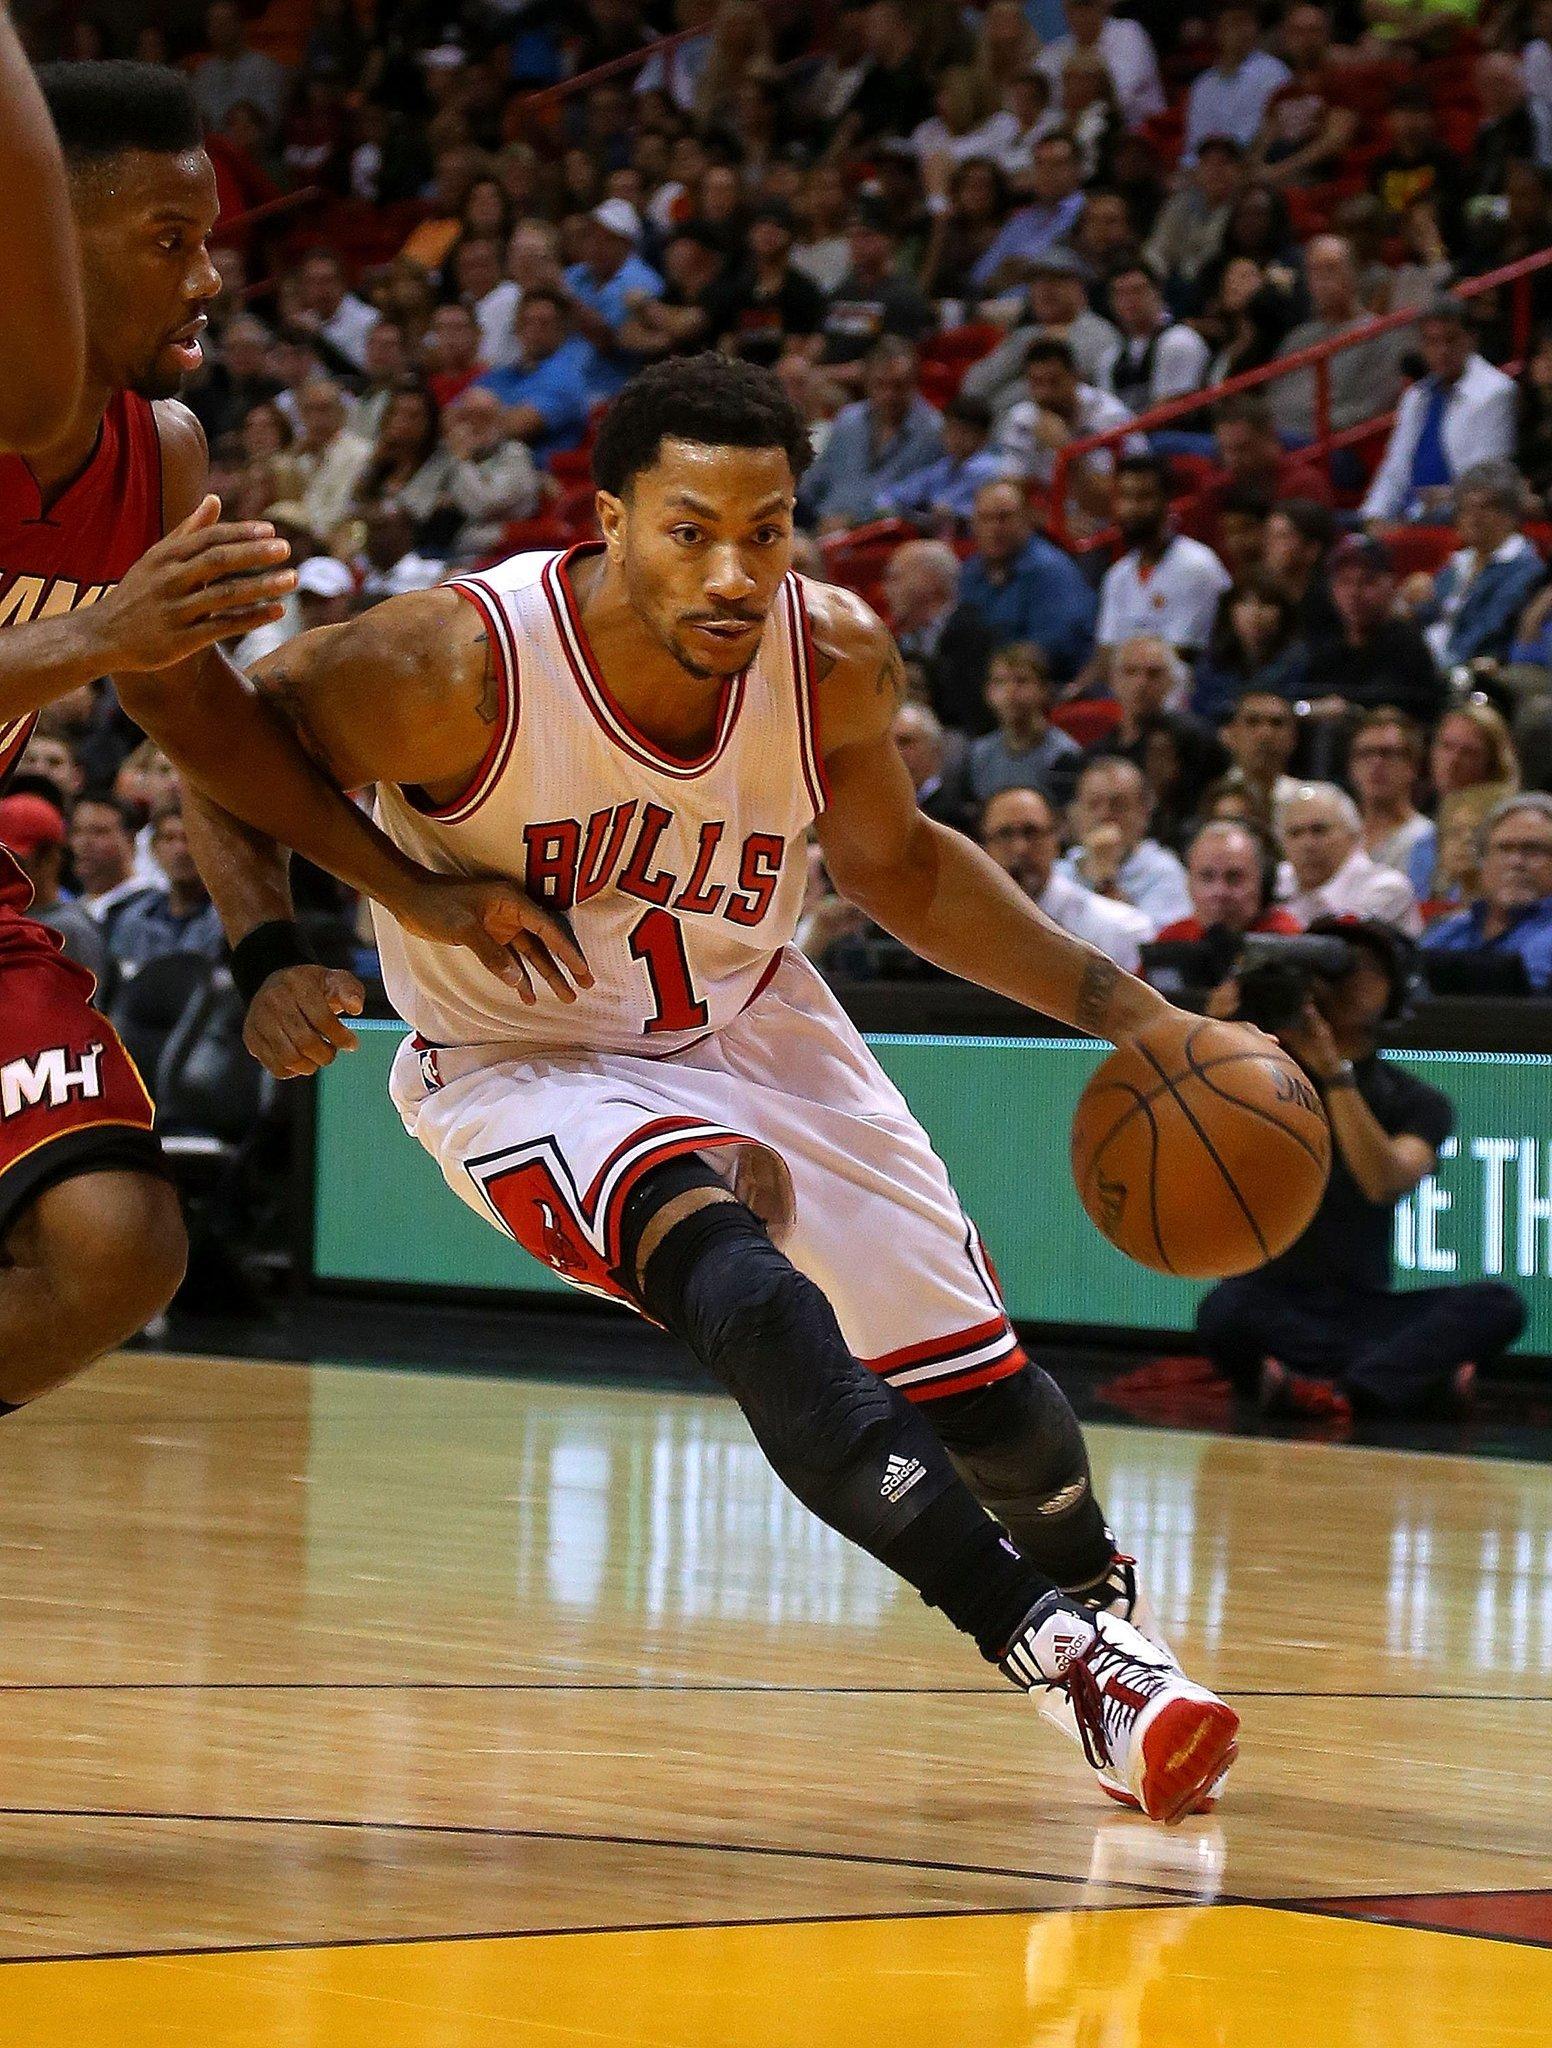 Sunday's recap: Bulls 93, Heat 75